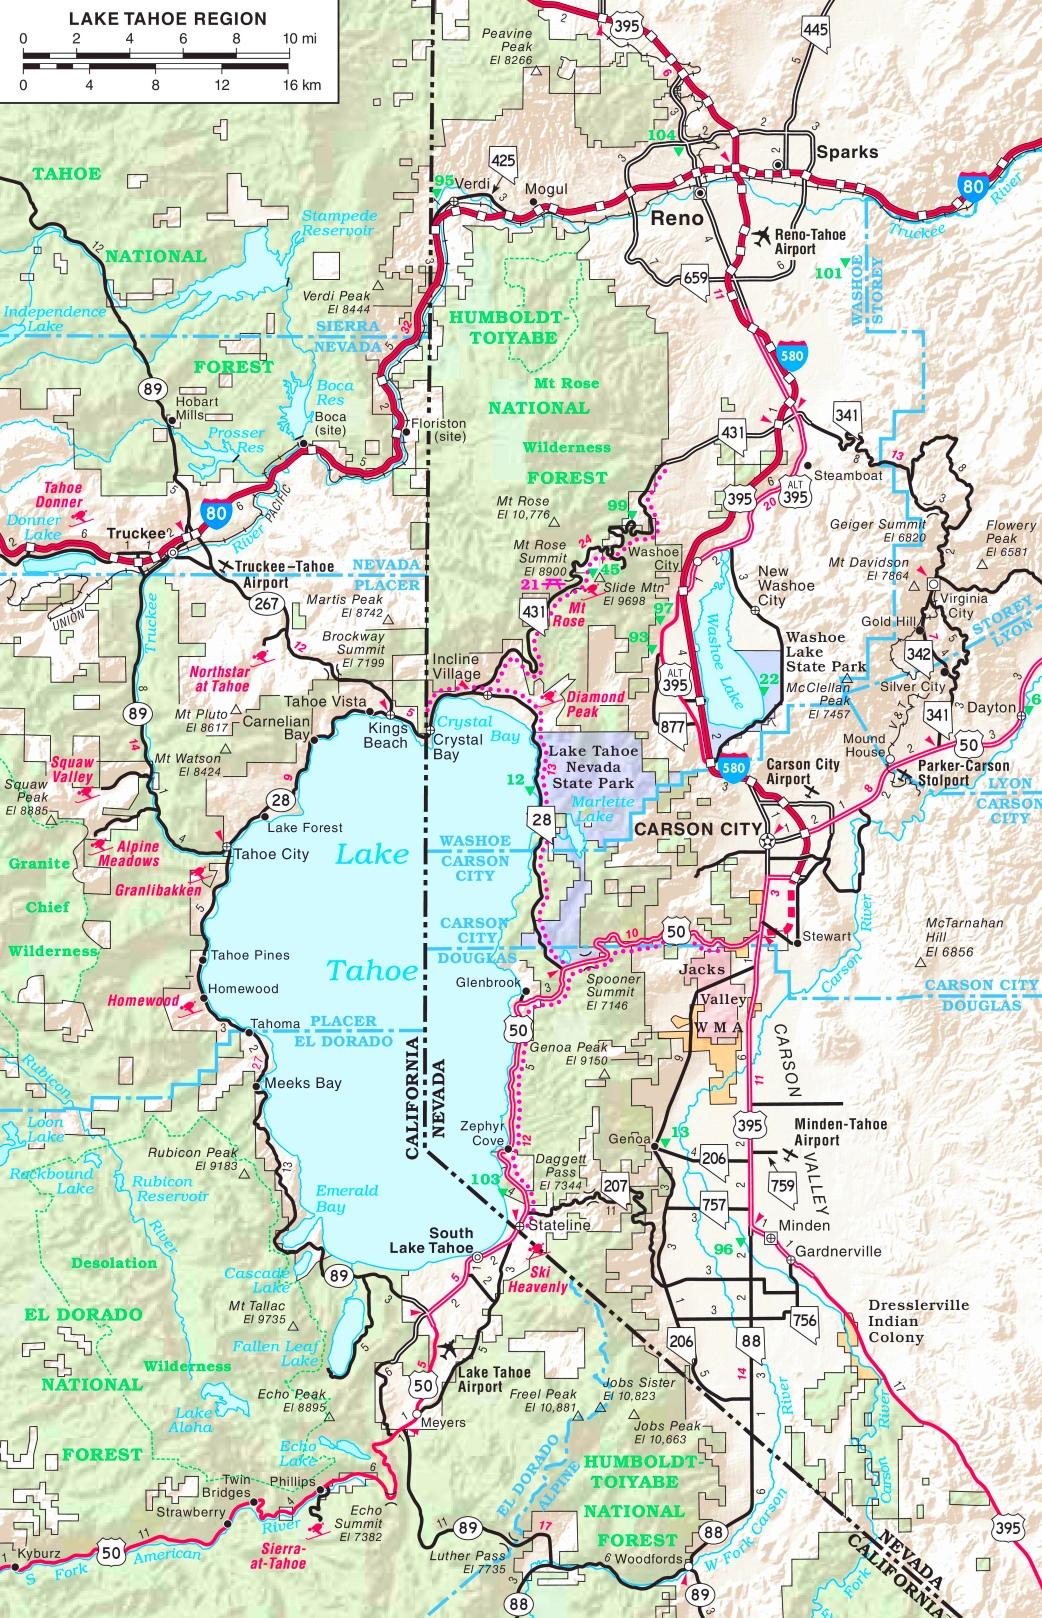 Lake Tahoe Road Map - Printable Map Of Lake Tahoe